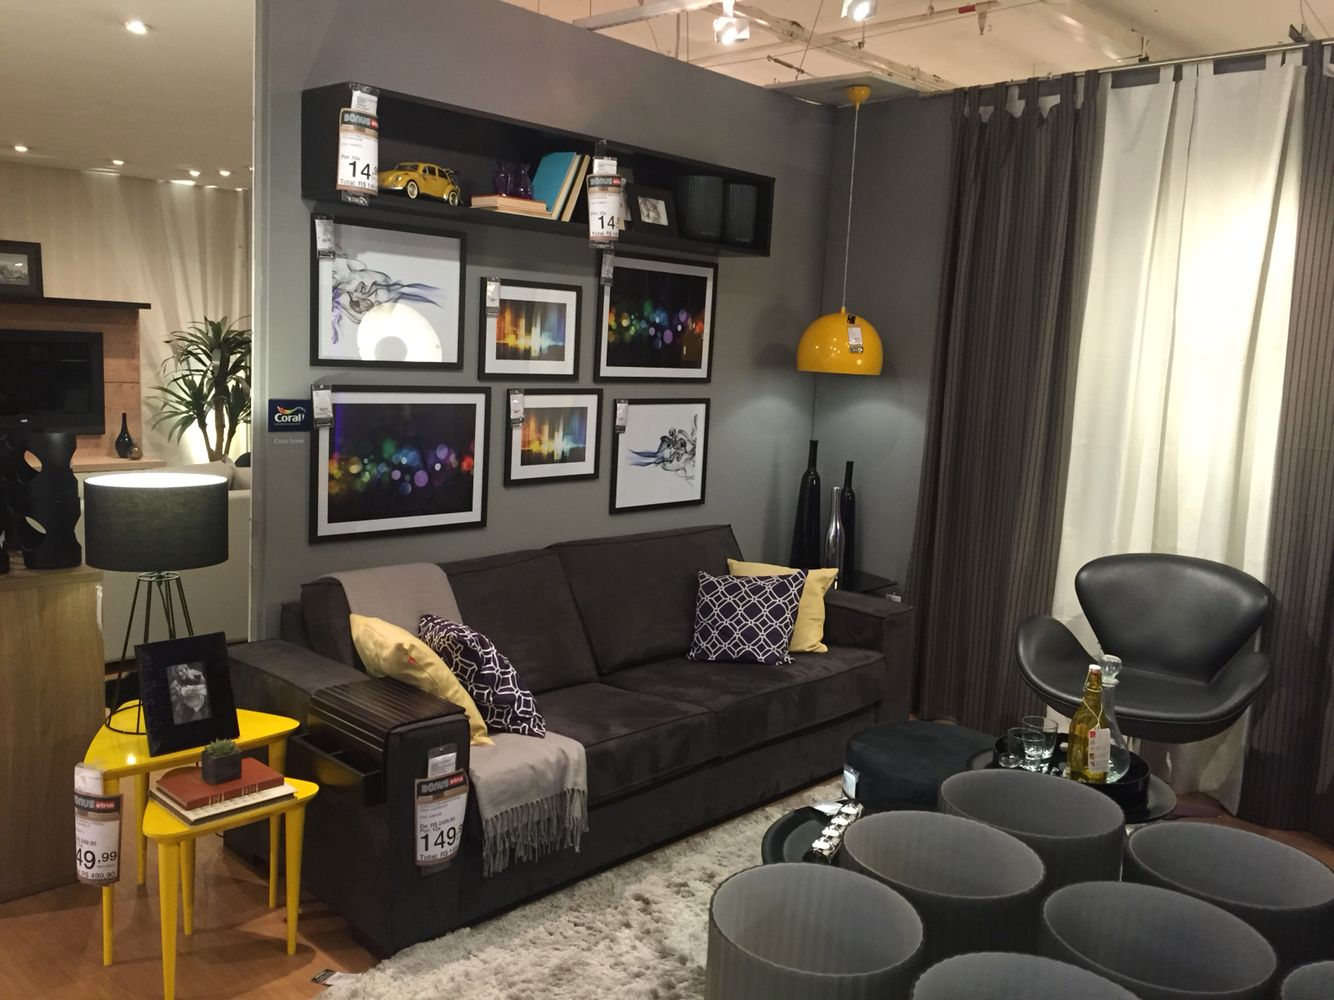 Sala De Estar Cinza E Amarelo ~ sala estar cinza e amarela etna em construção sala de estar maquete